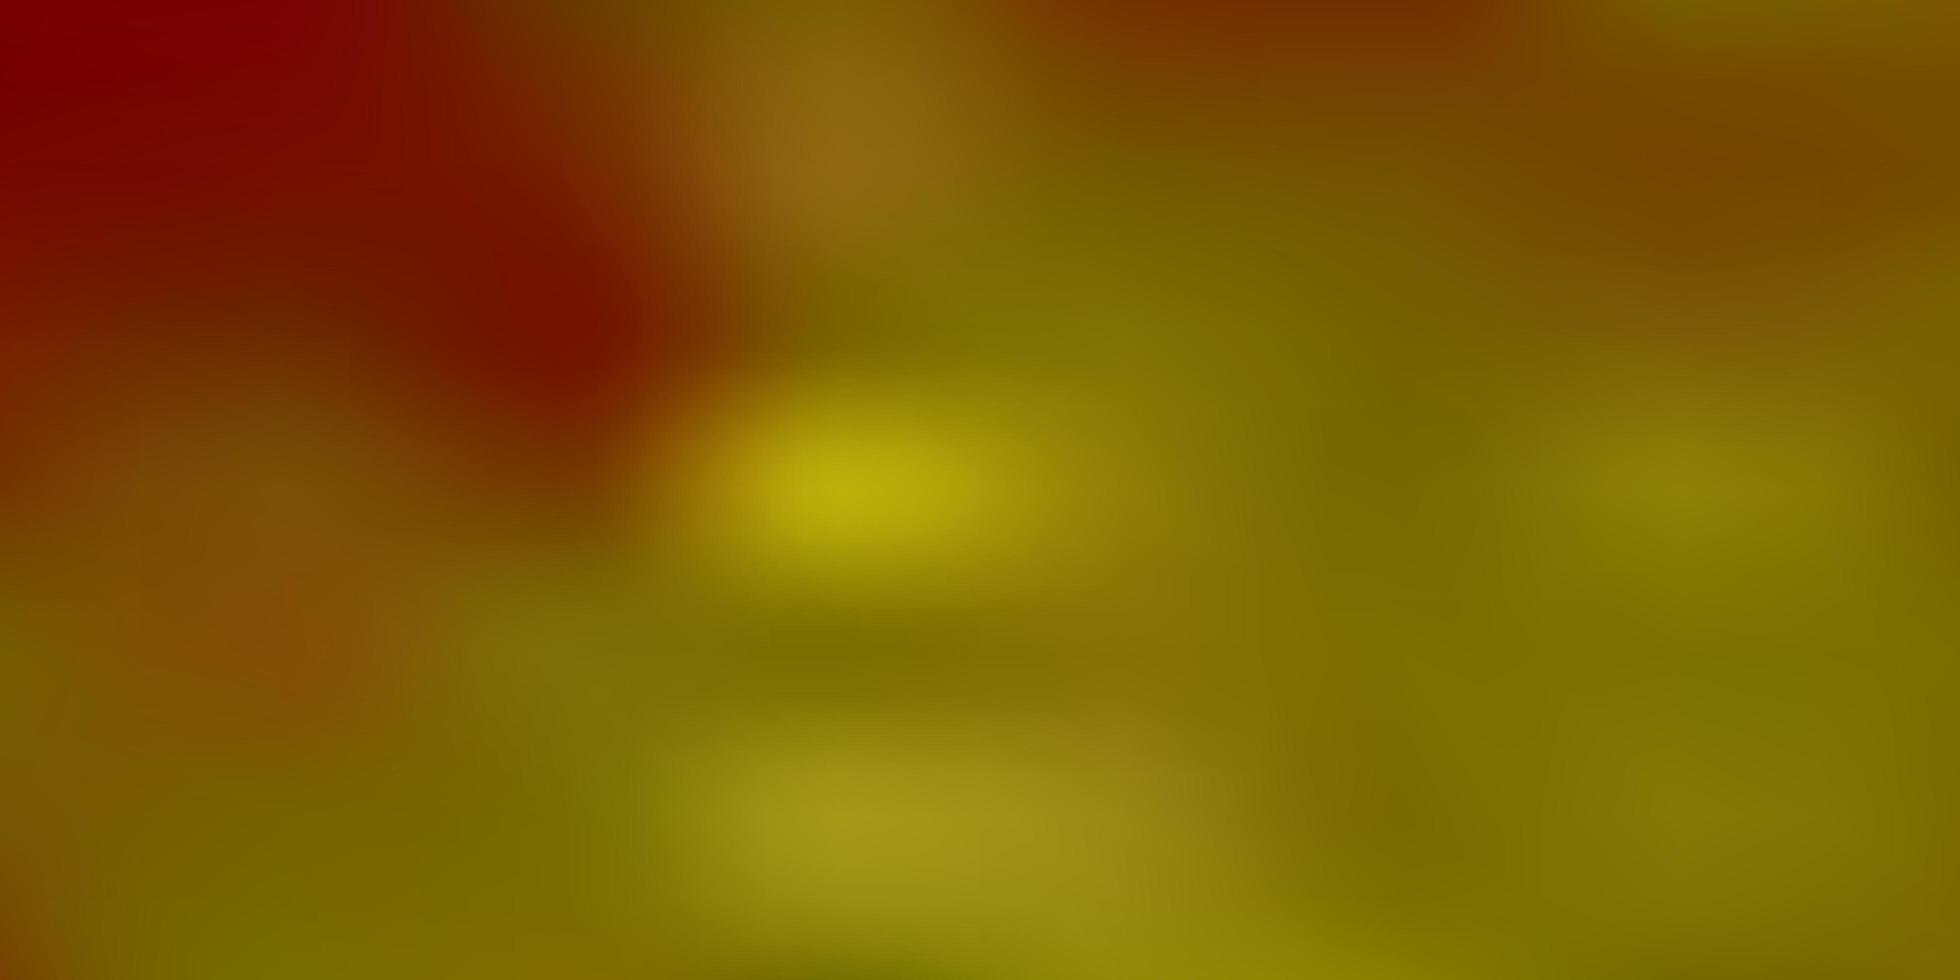 hellgelbes Vektorgradienten-Unschärfemuster. vektor